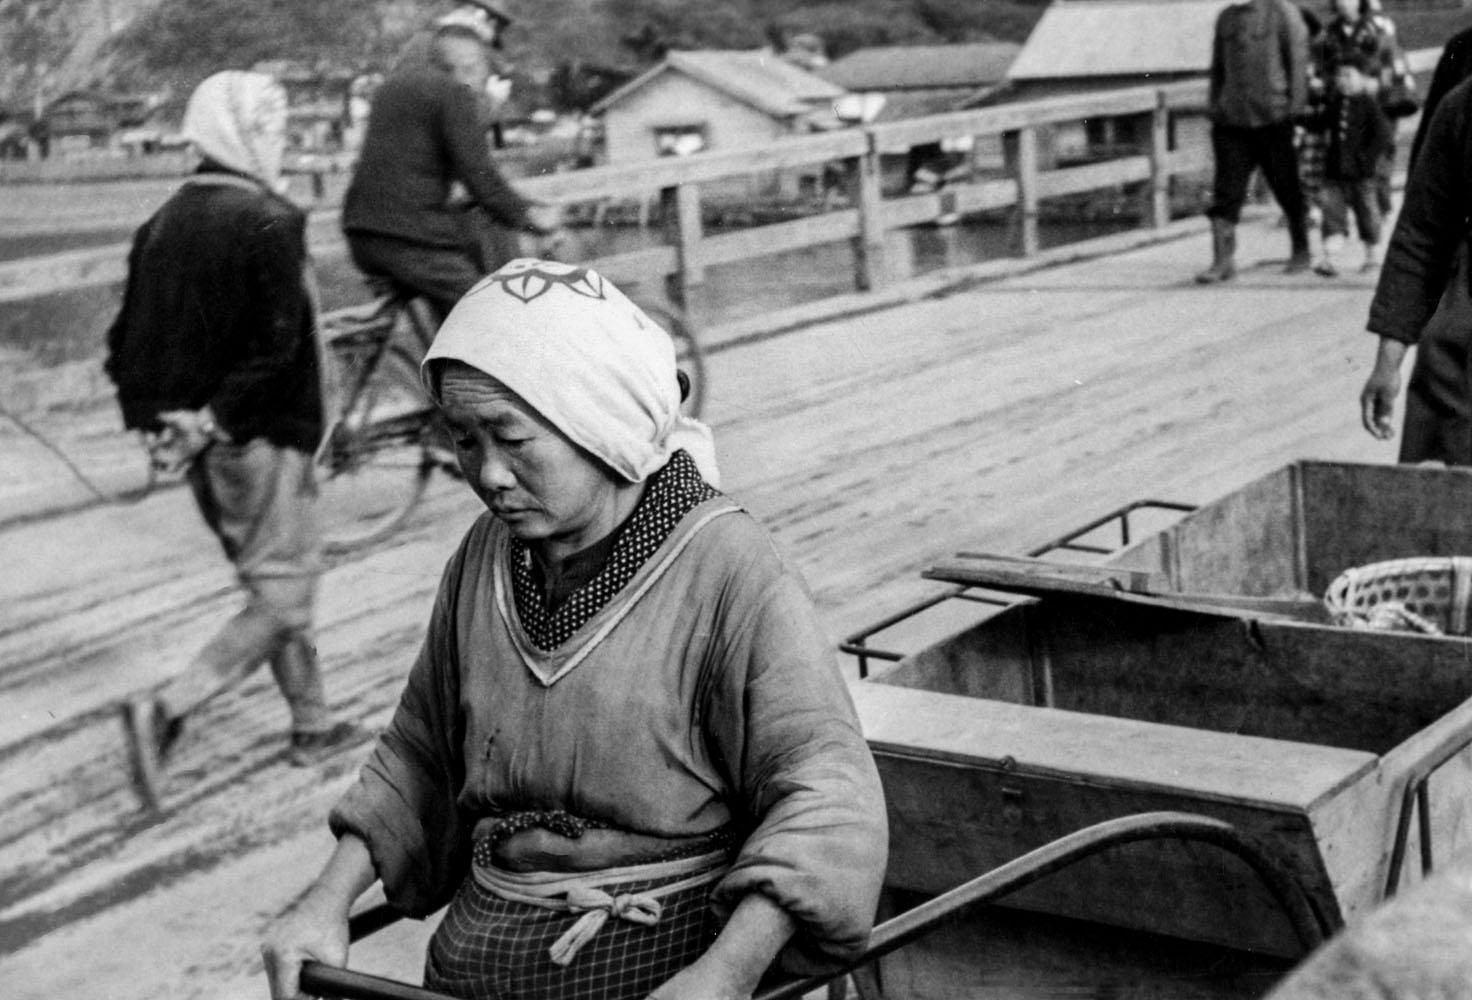 418-Kyukitakami Bridge, Woman Pulling Empty Vegetable Cart